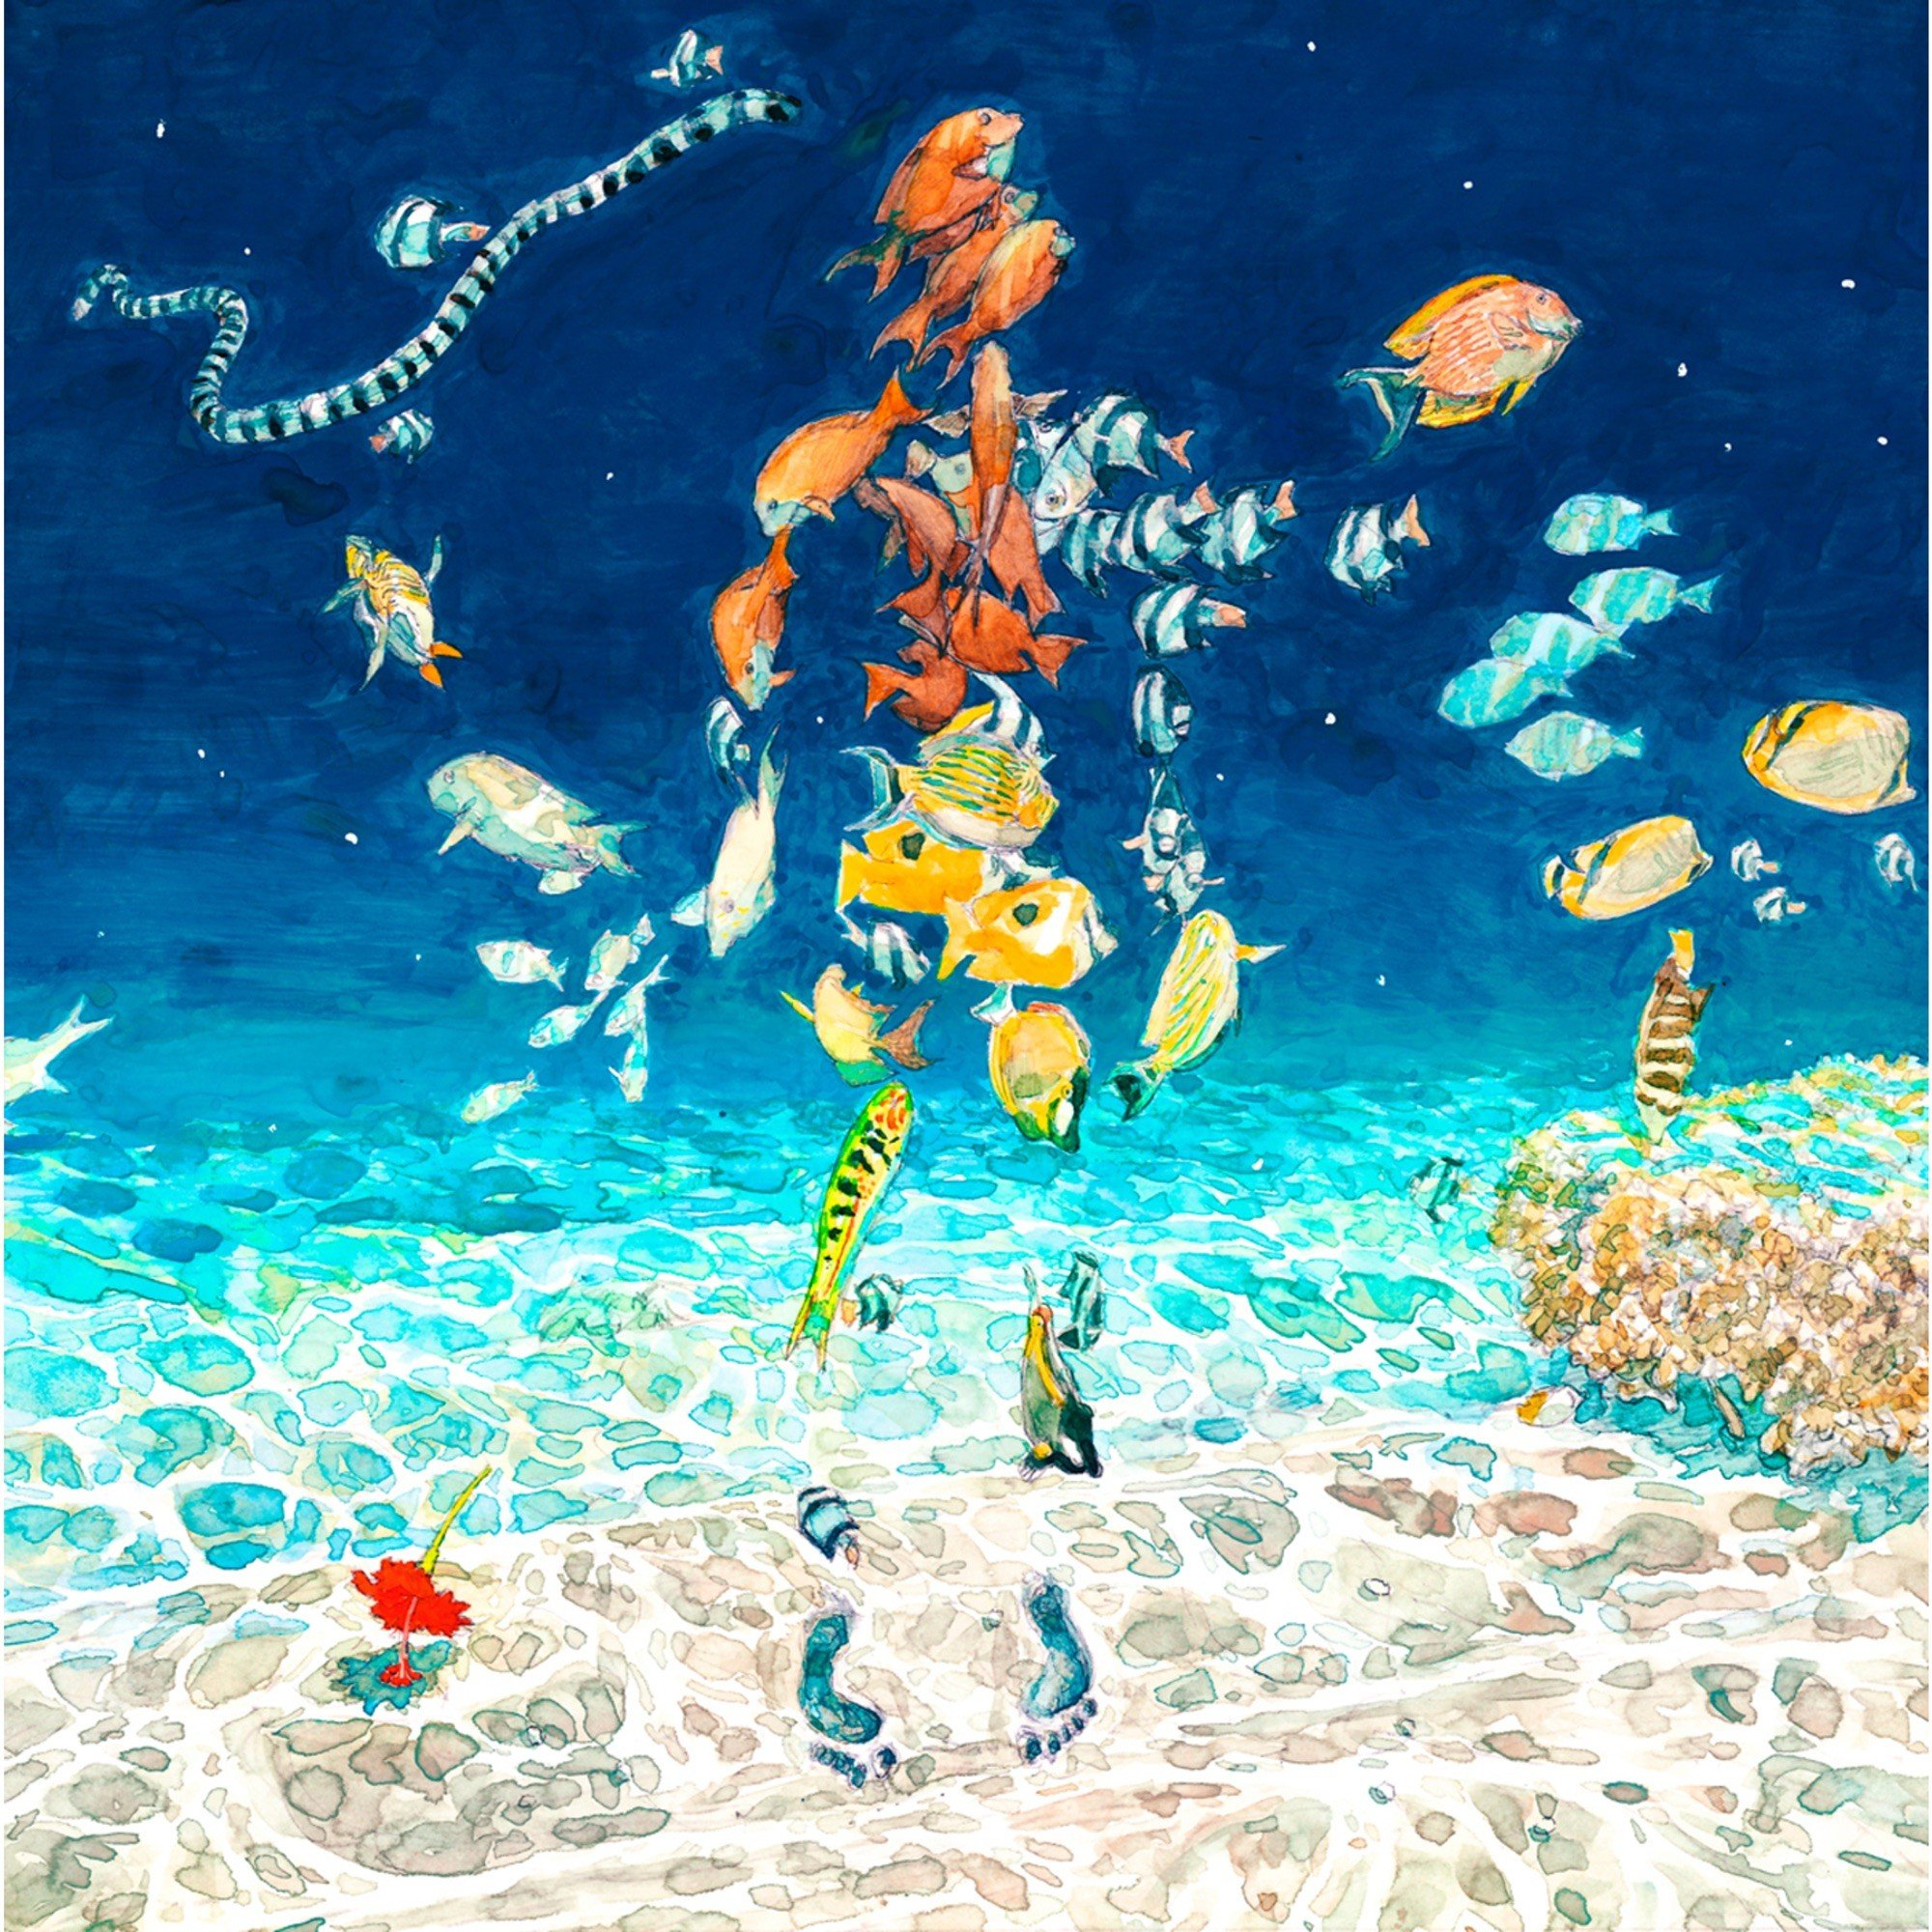 米津玄師 (Kenshi Yonezu) – 海の幽霊 [Mora FLAC 24bit/96kHz]